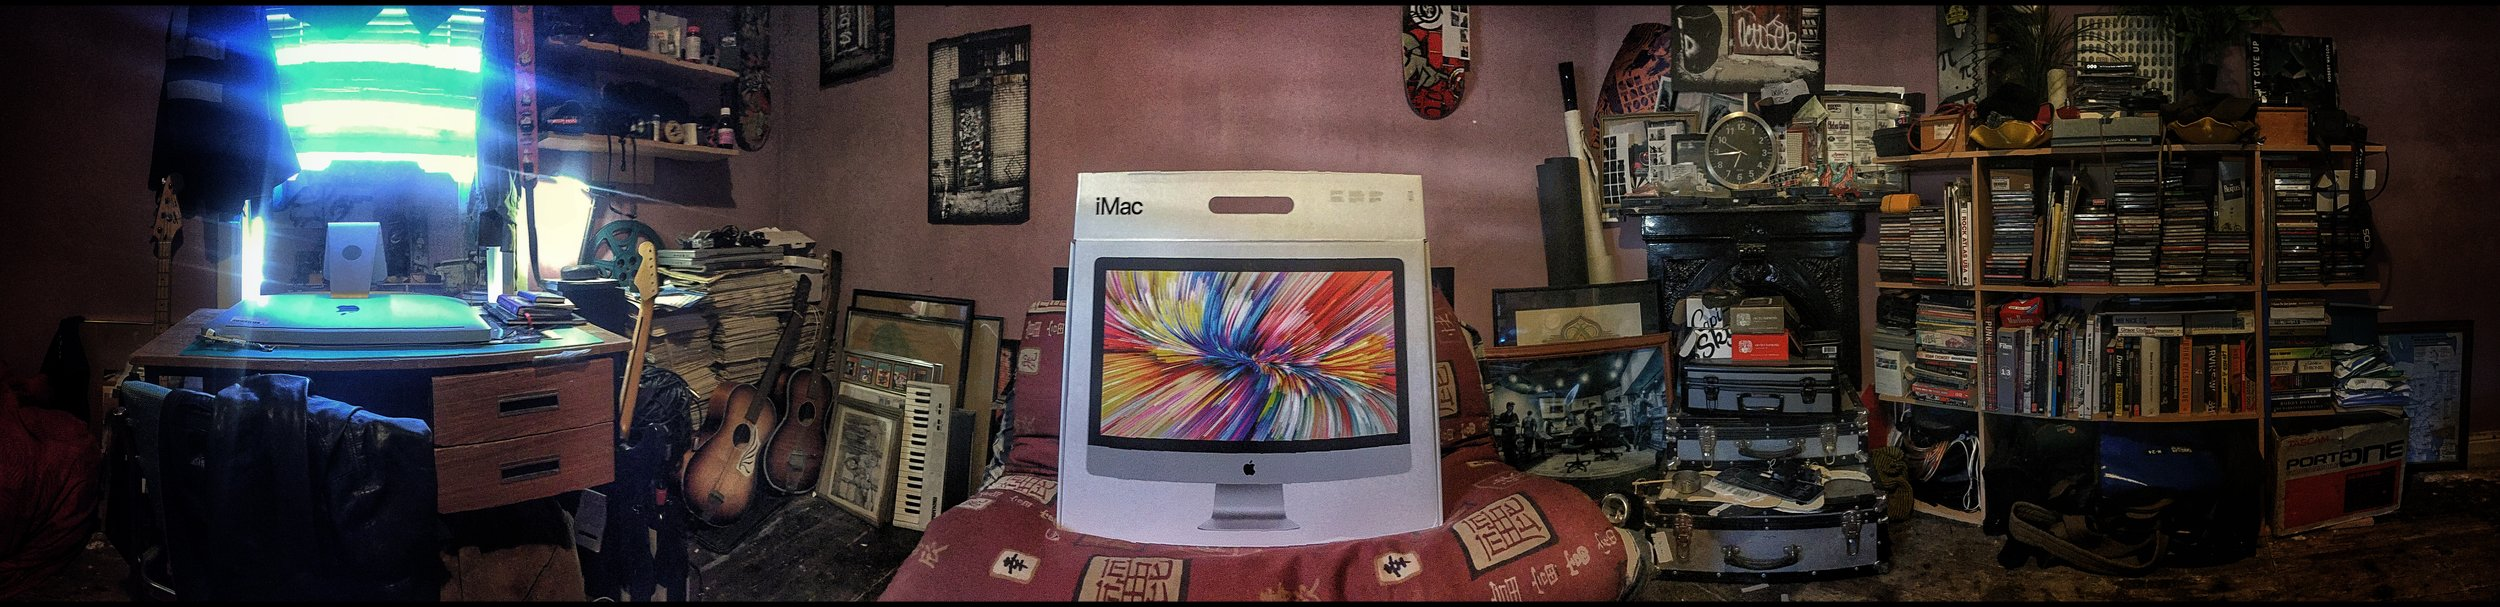 27‑inch iMac with Retina 5K display